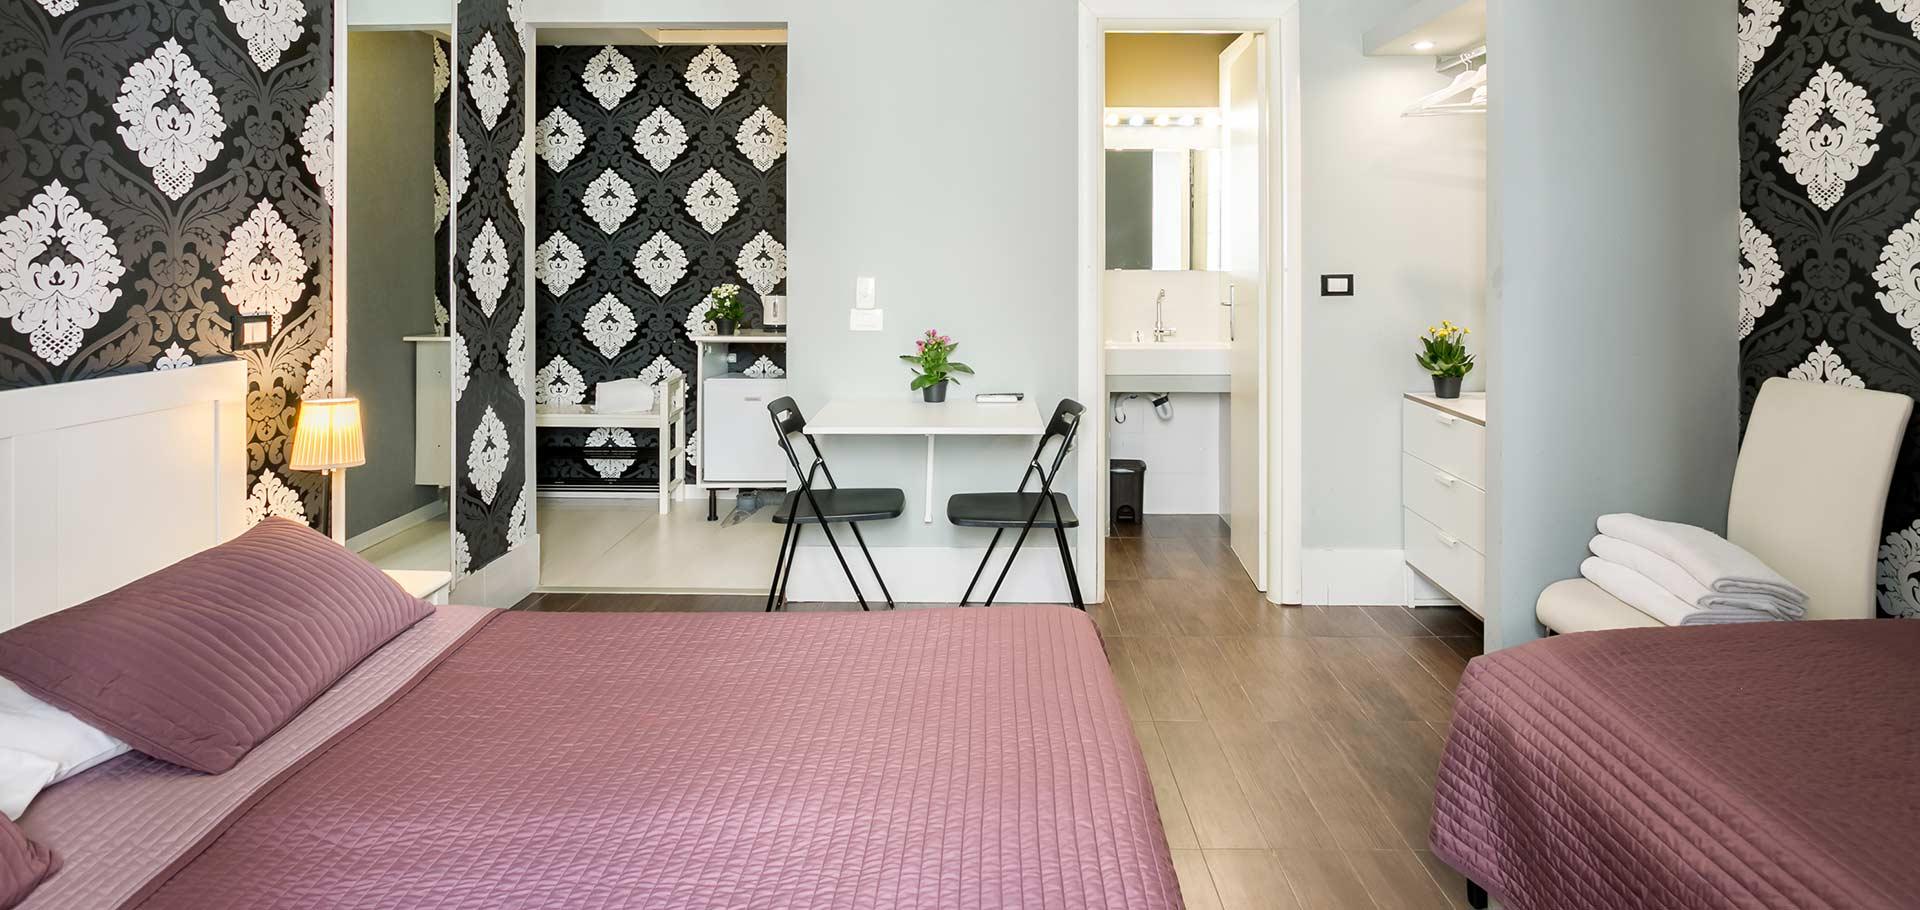 Amoroma Suite - Appartamento